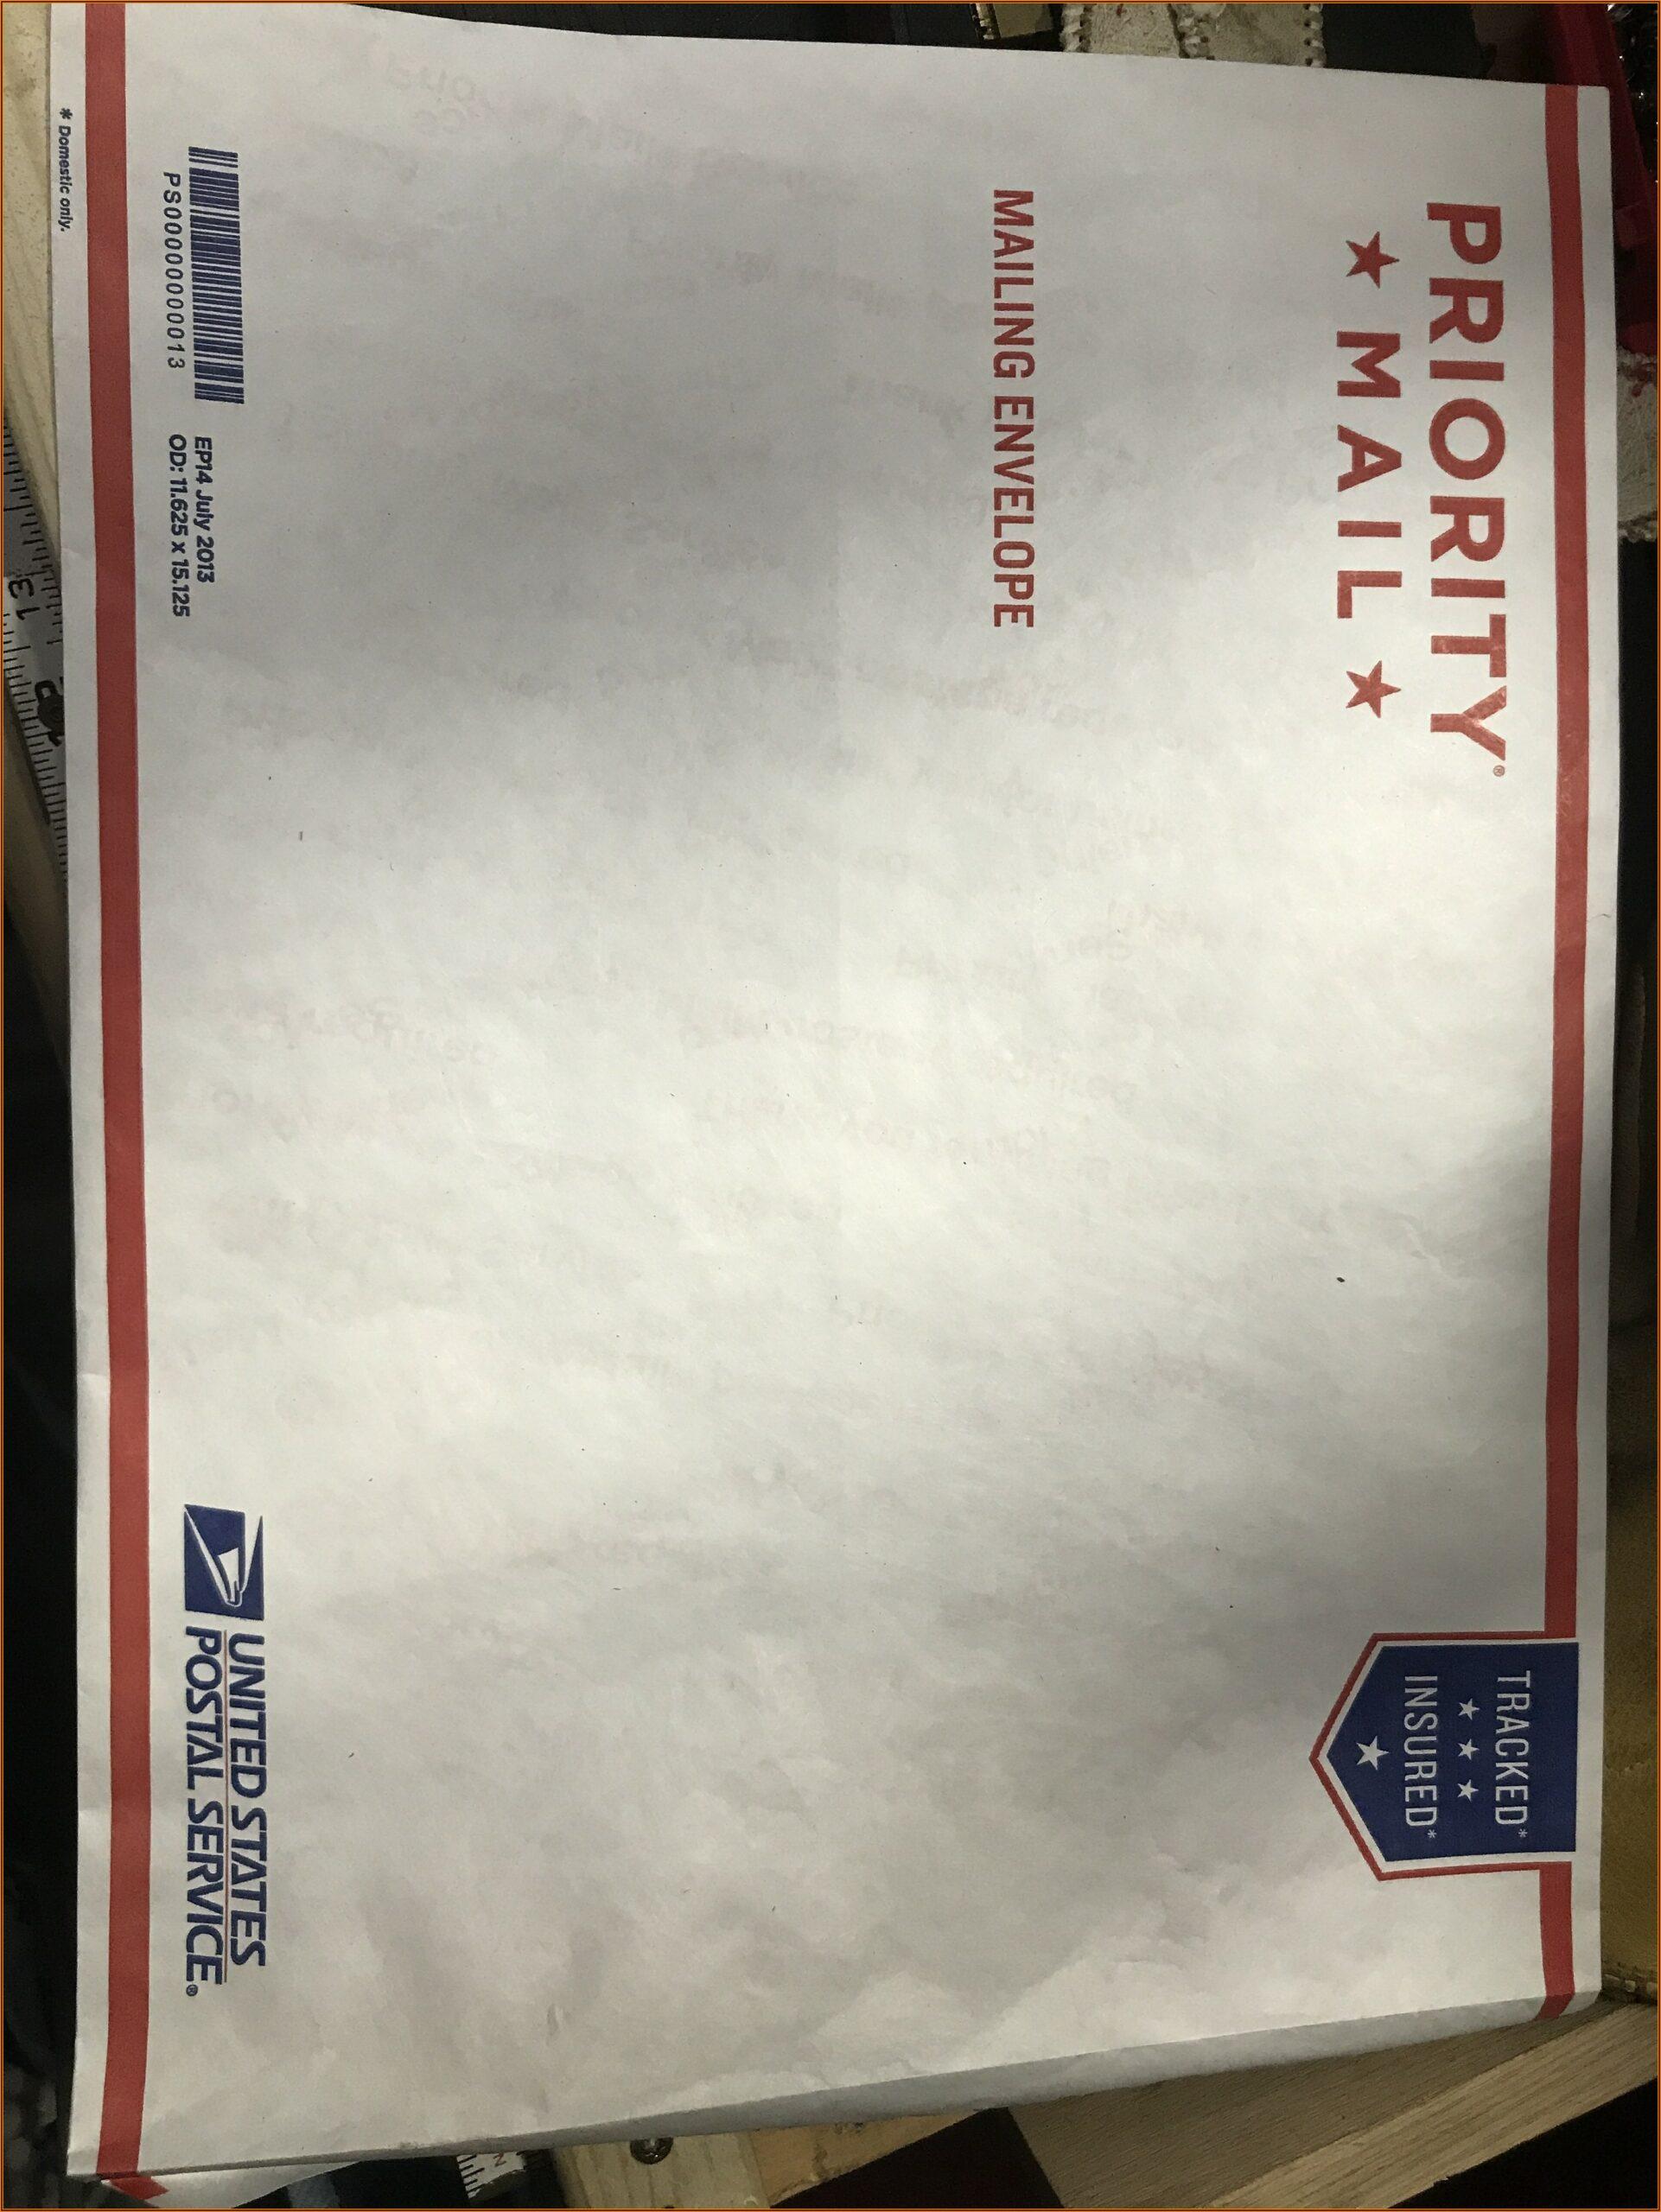 Usps Flat Rate Envelope Rules